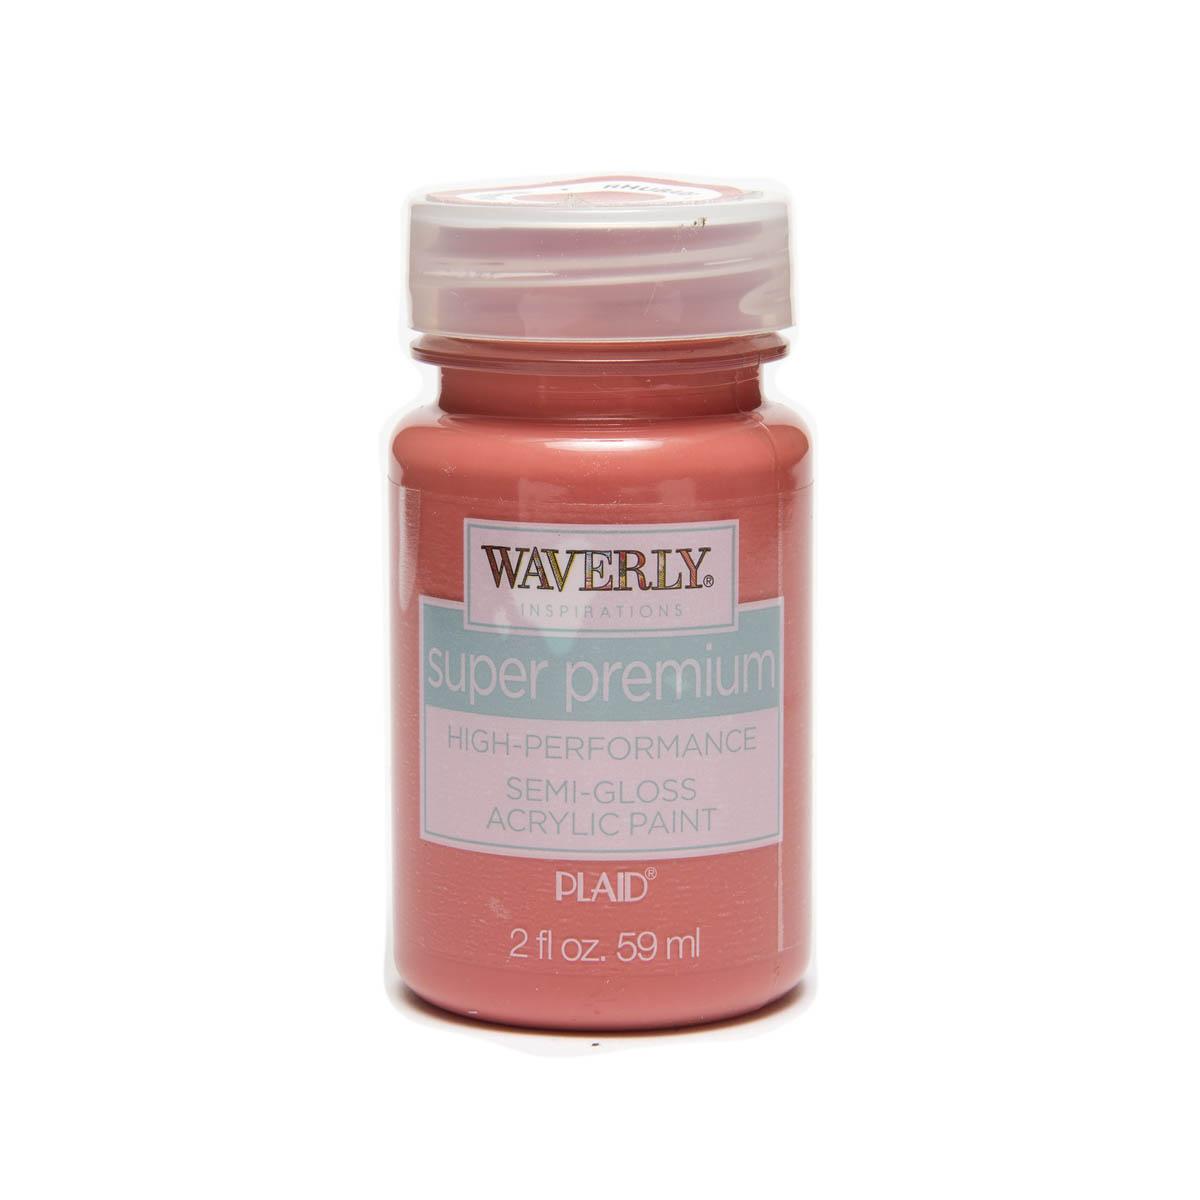 Waverly ® Inspirations Super Premium Semi-Gloss Acrylic Paint - Rhubarb, 2 oz.